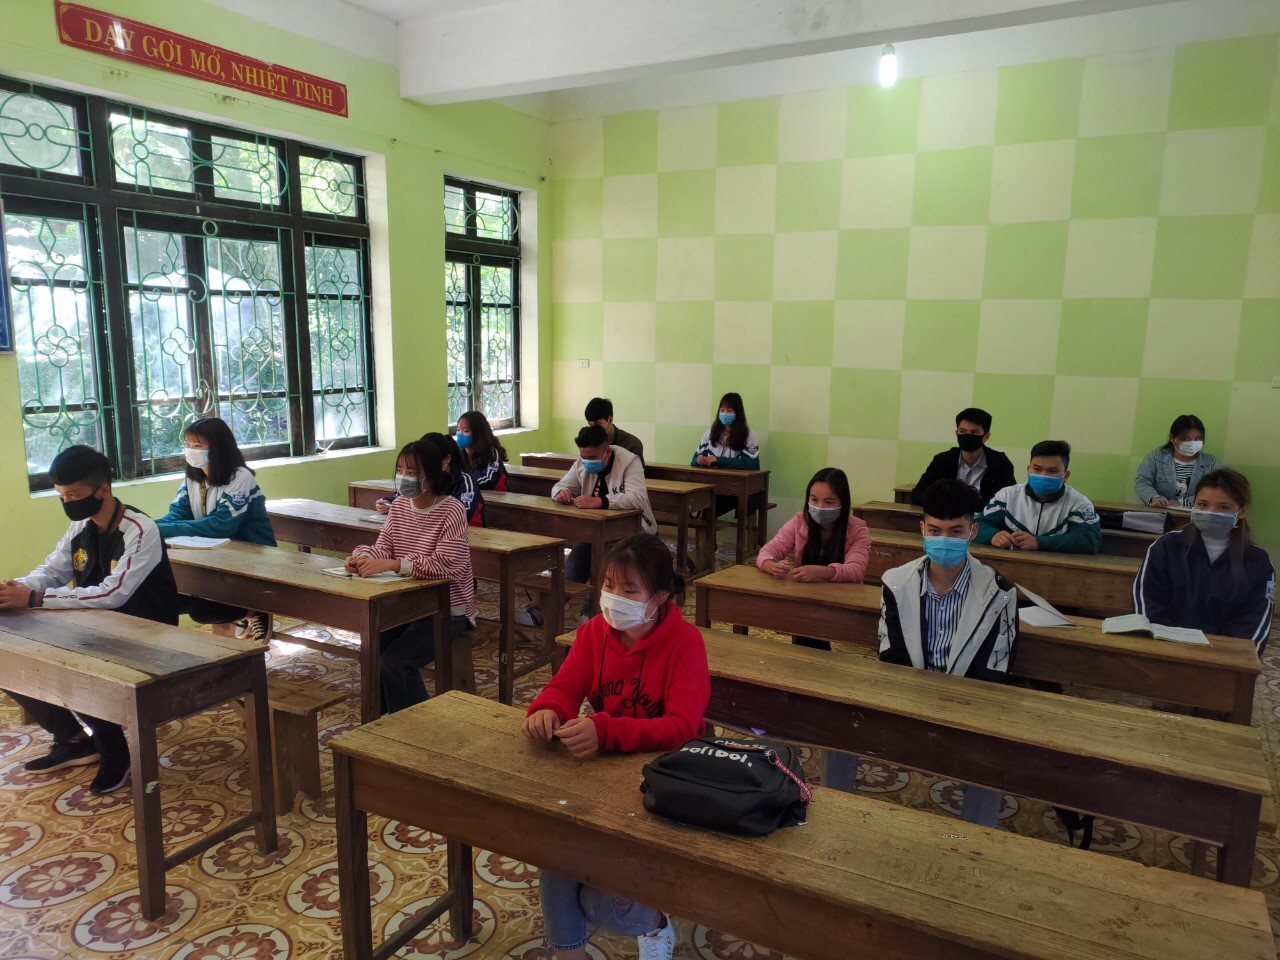 Vietnam 2020 high school grad exam_safe distancing